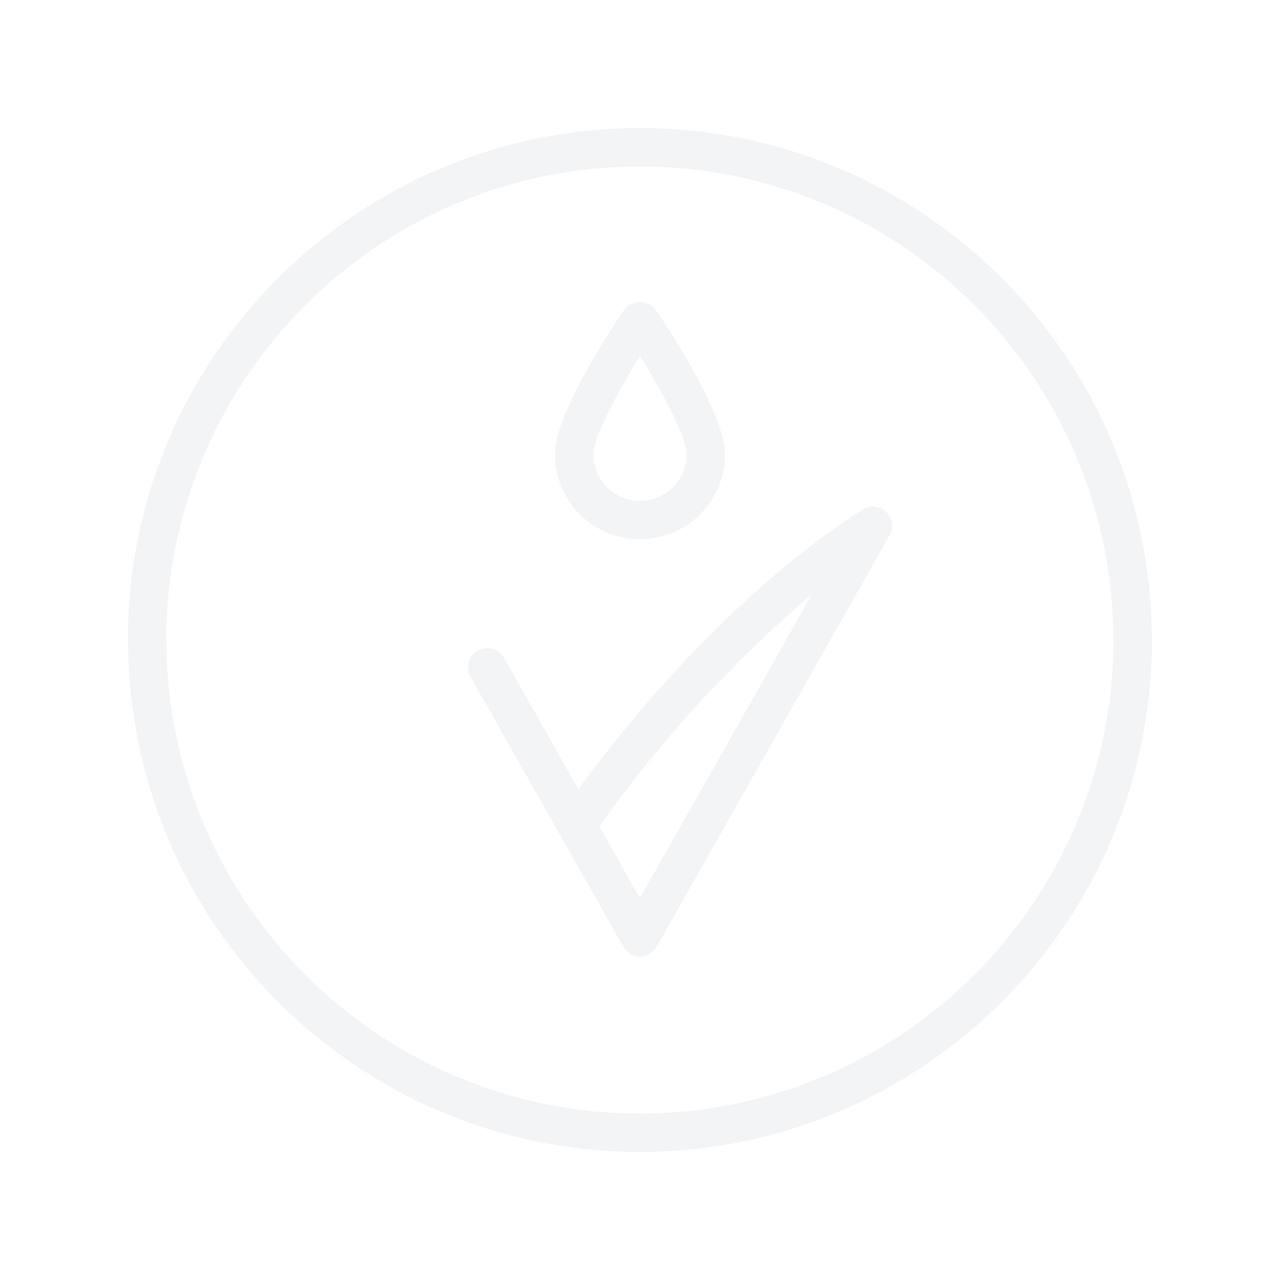 ALESSANDRO Nail Polish No.930 My First Love 5ml